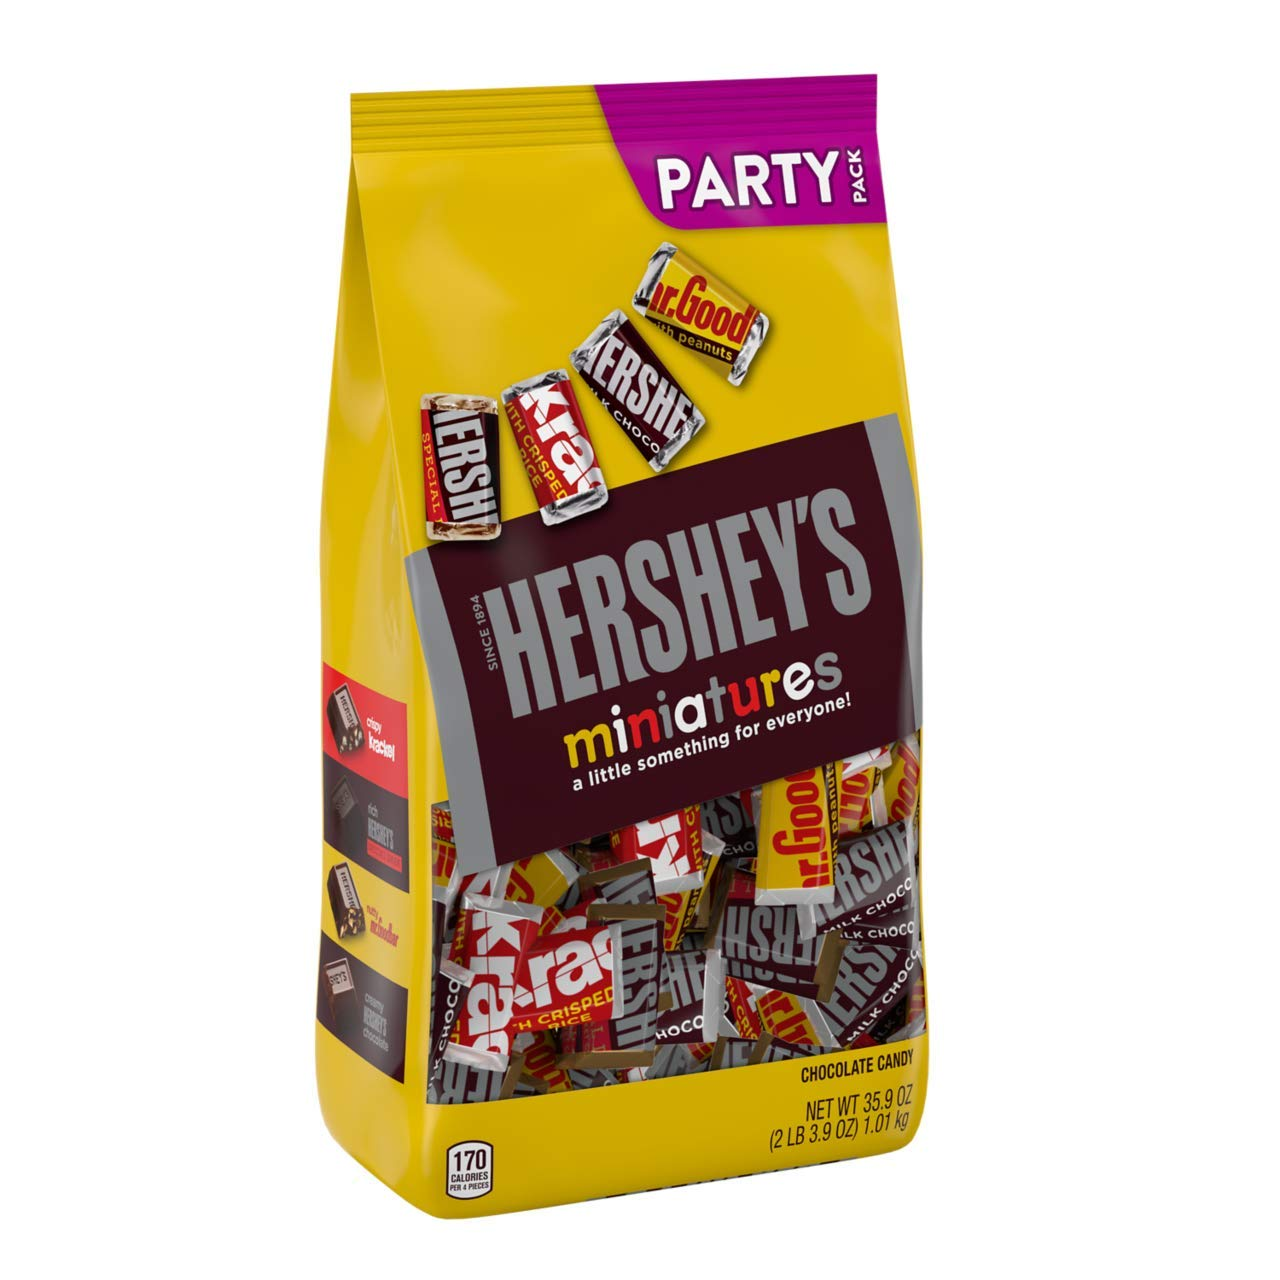 Hershey'S Miniatures Halloween Candy Assortment, Chocolate, 35.9 Oz